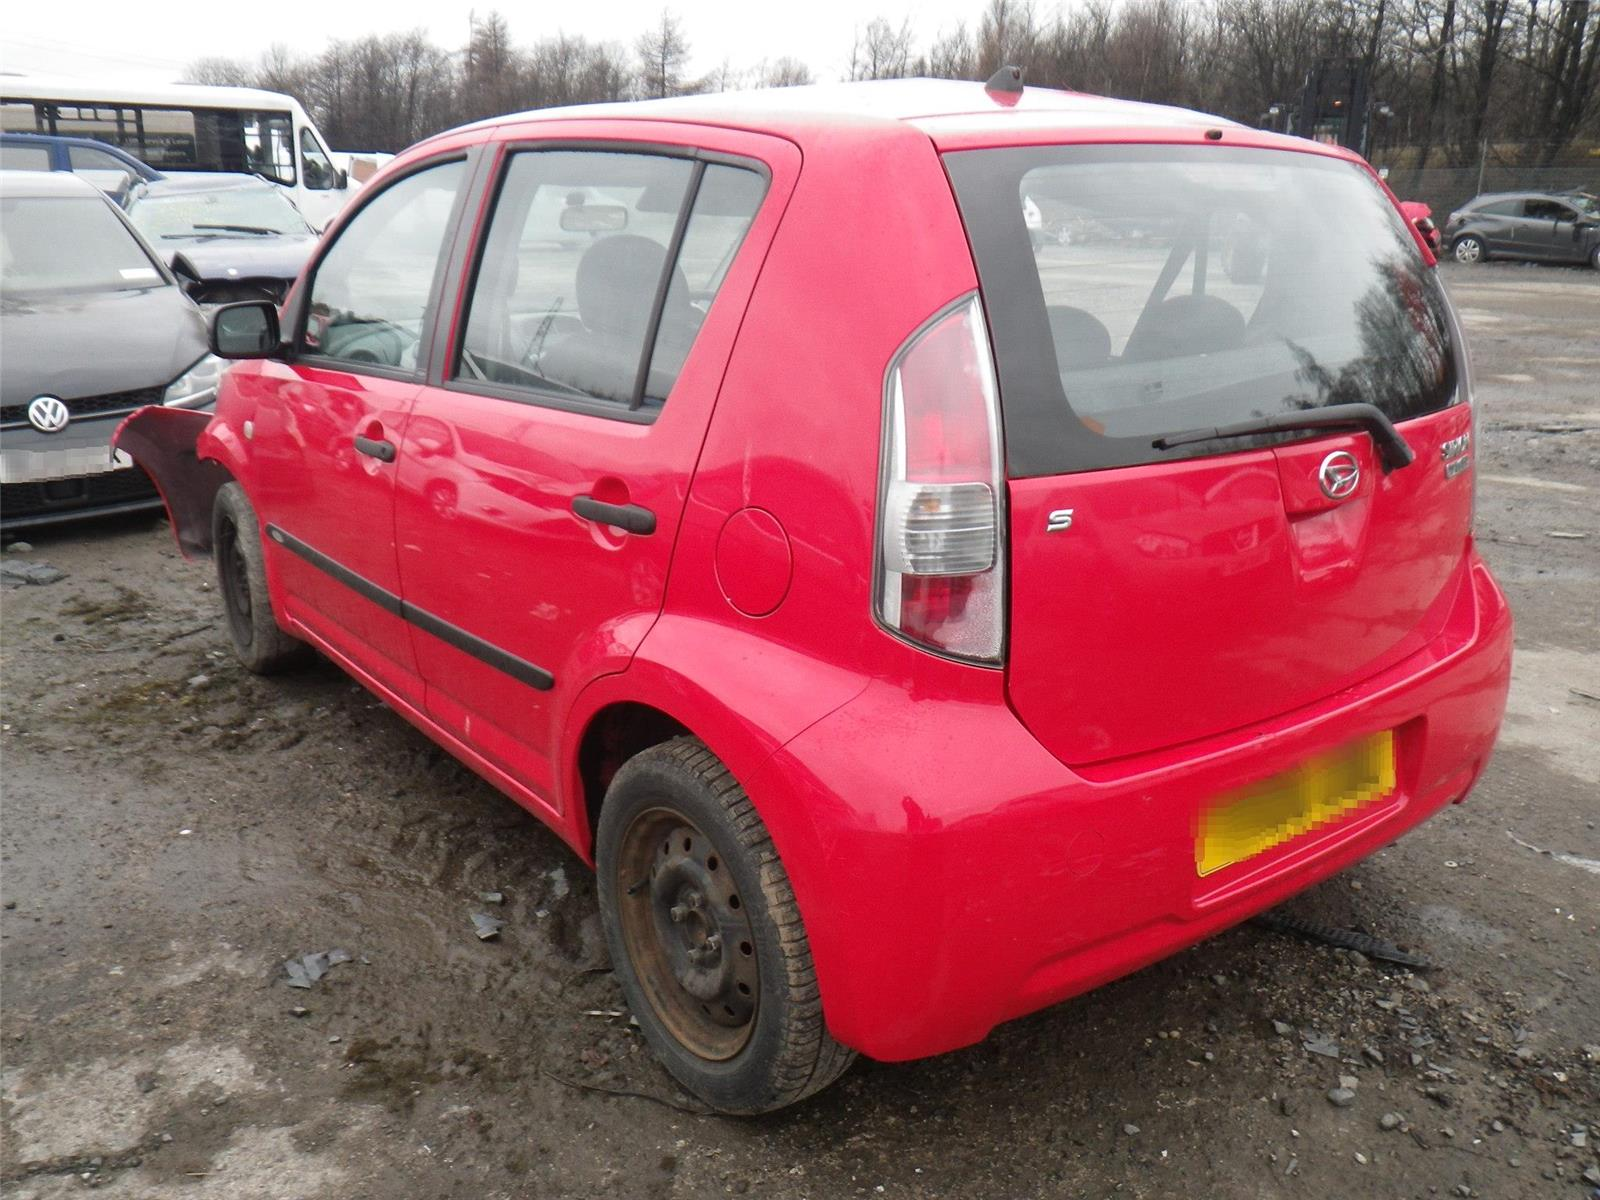 ... 2006 Daihatsu Sirion 2005 To 2010 1.0l Manual Petrol Car Transmission  Assembly ...